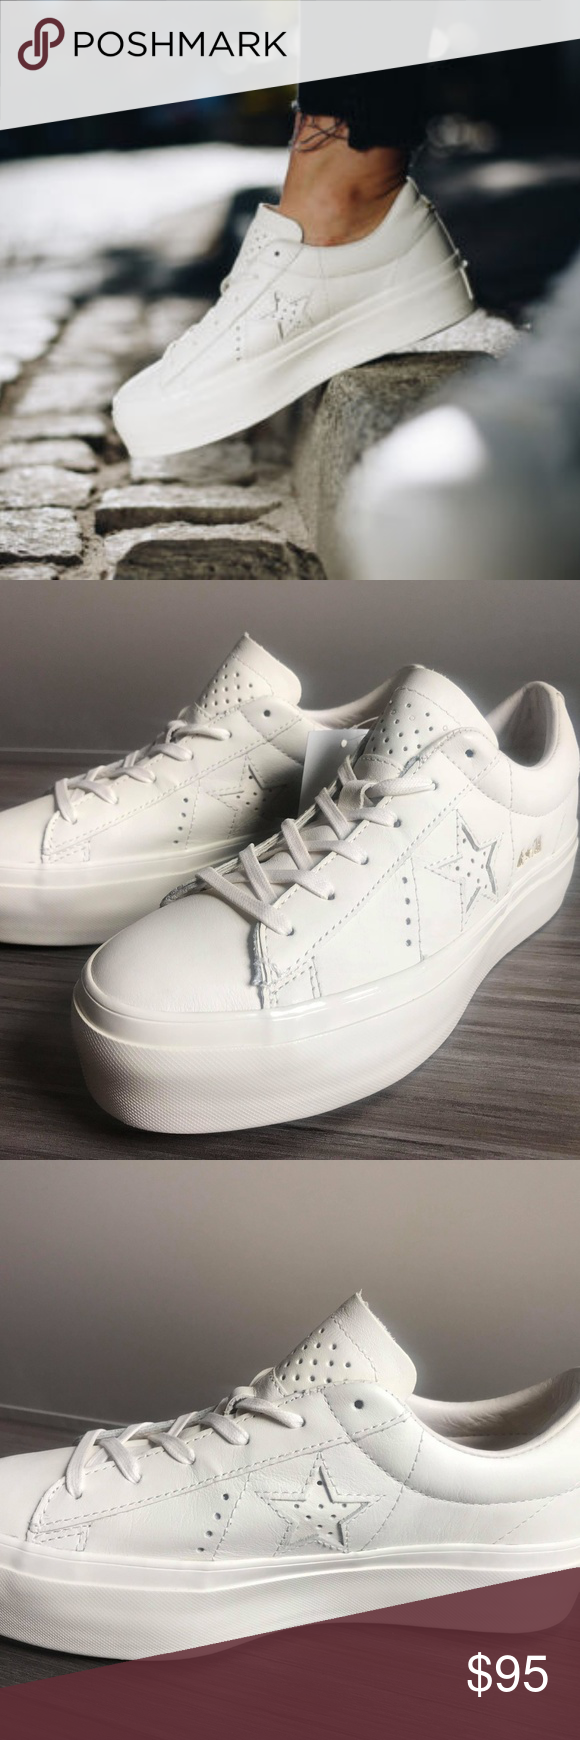 Converse One Star Platform OX SHOES SIZE 7.5 Women Women s Size 7.5 COLOR   WHITE  afa99bfe4